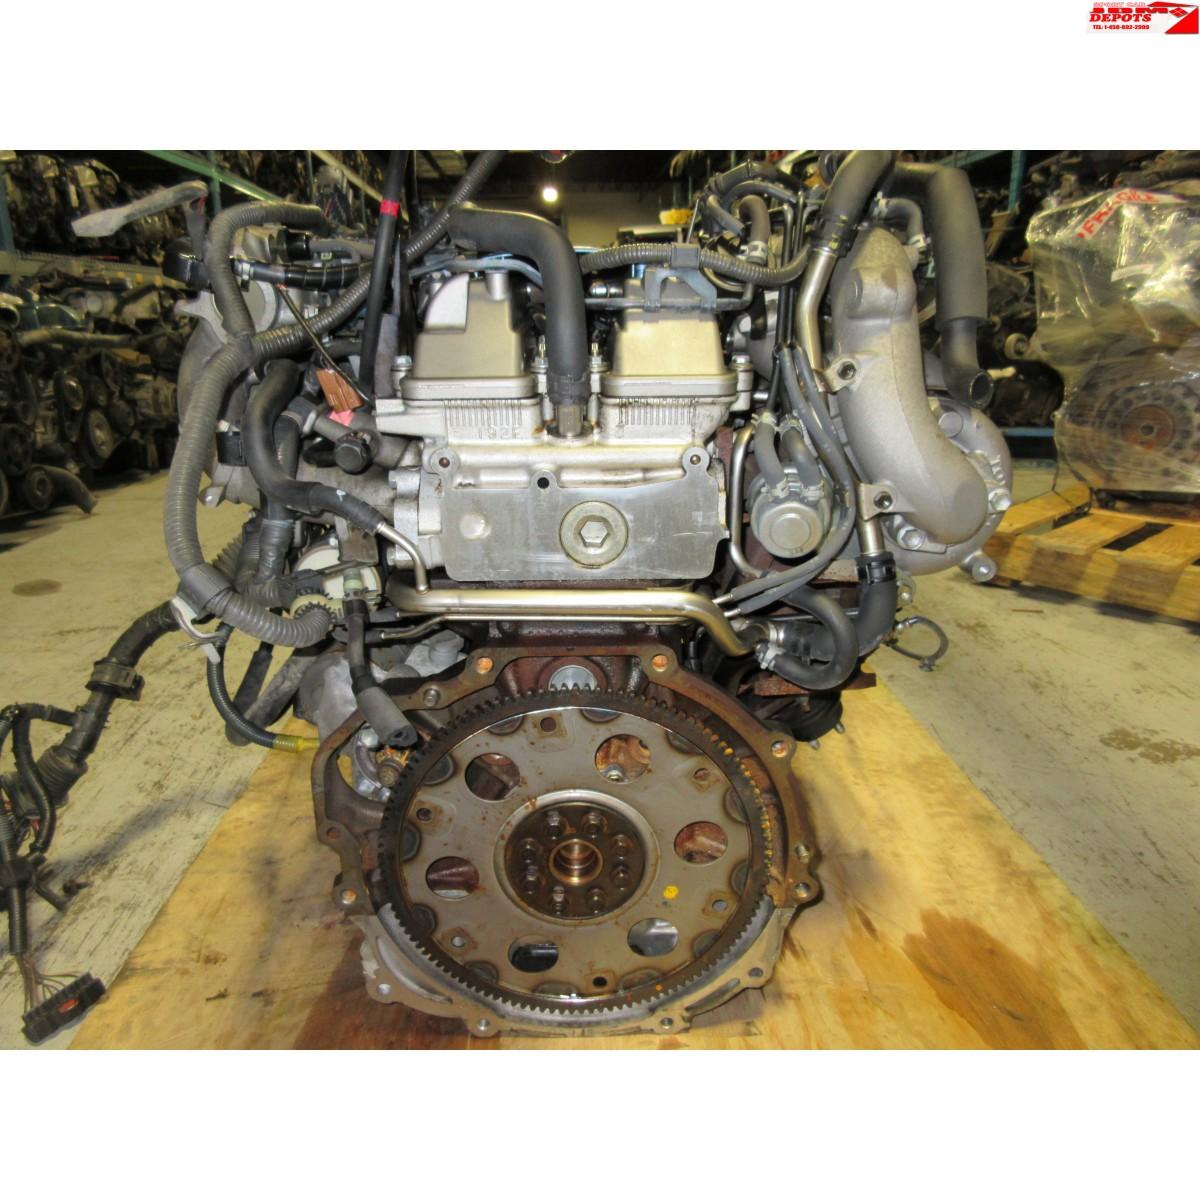 Supra Twin Turbo Vvti Engine Trans And Wiring Only Jdm 2jzgte 2jz